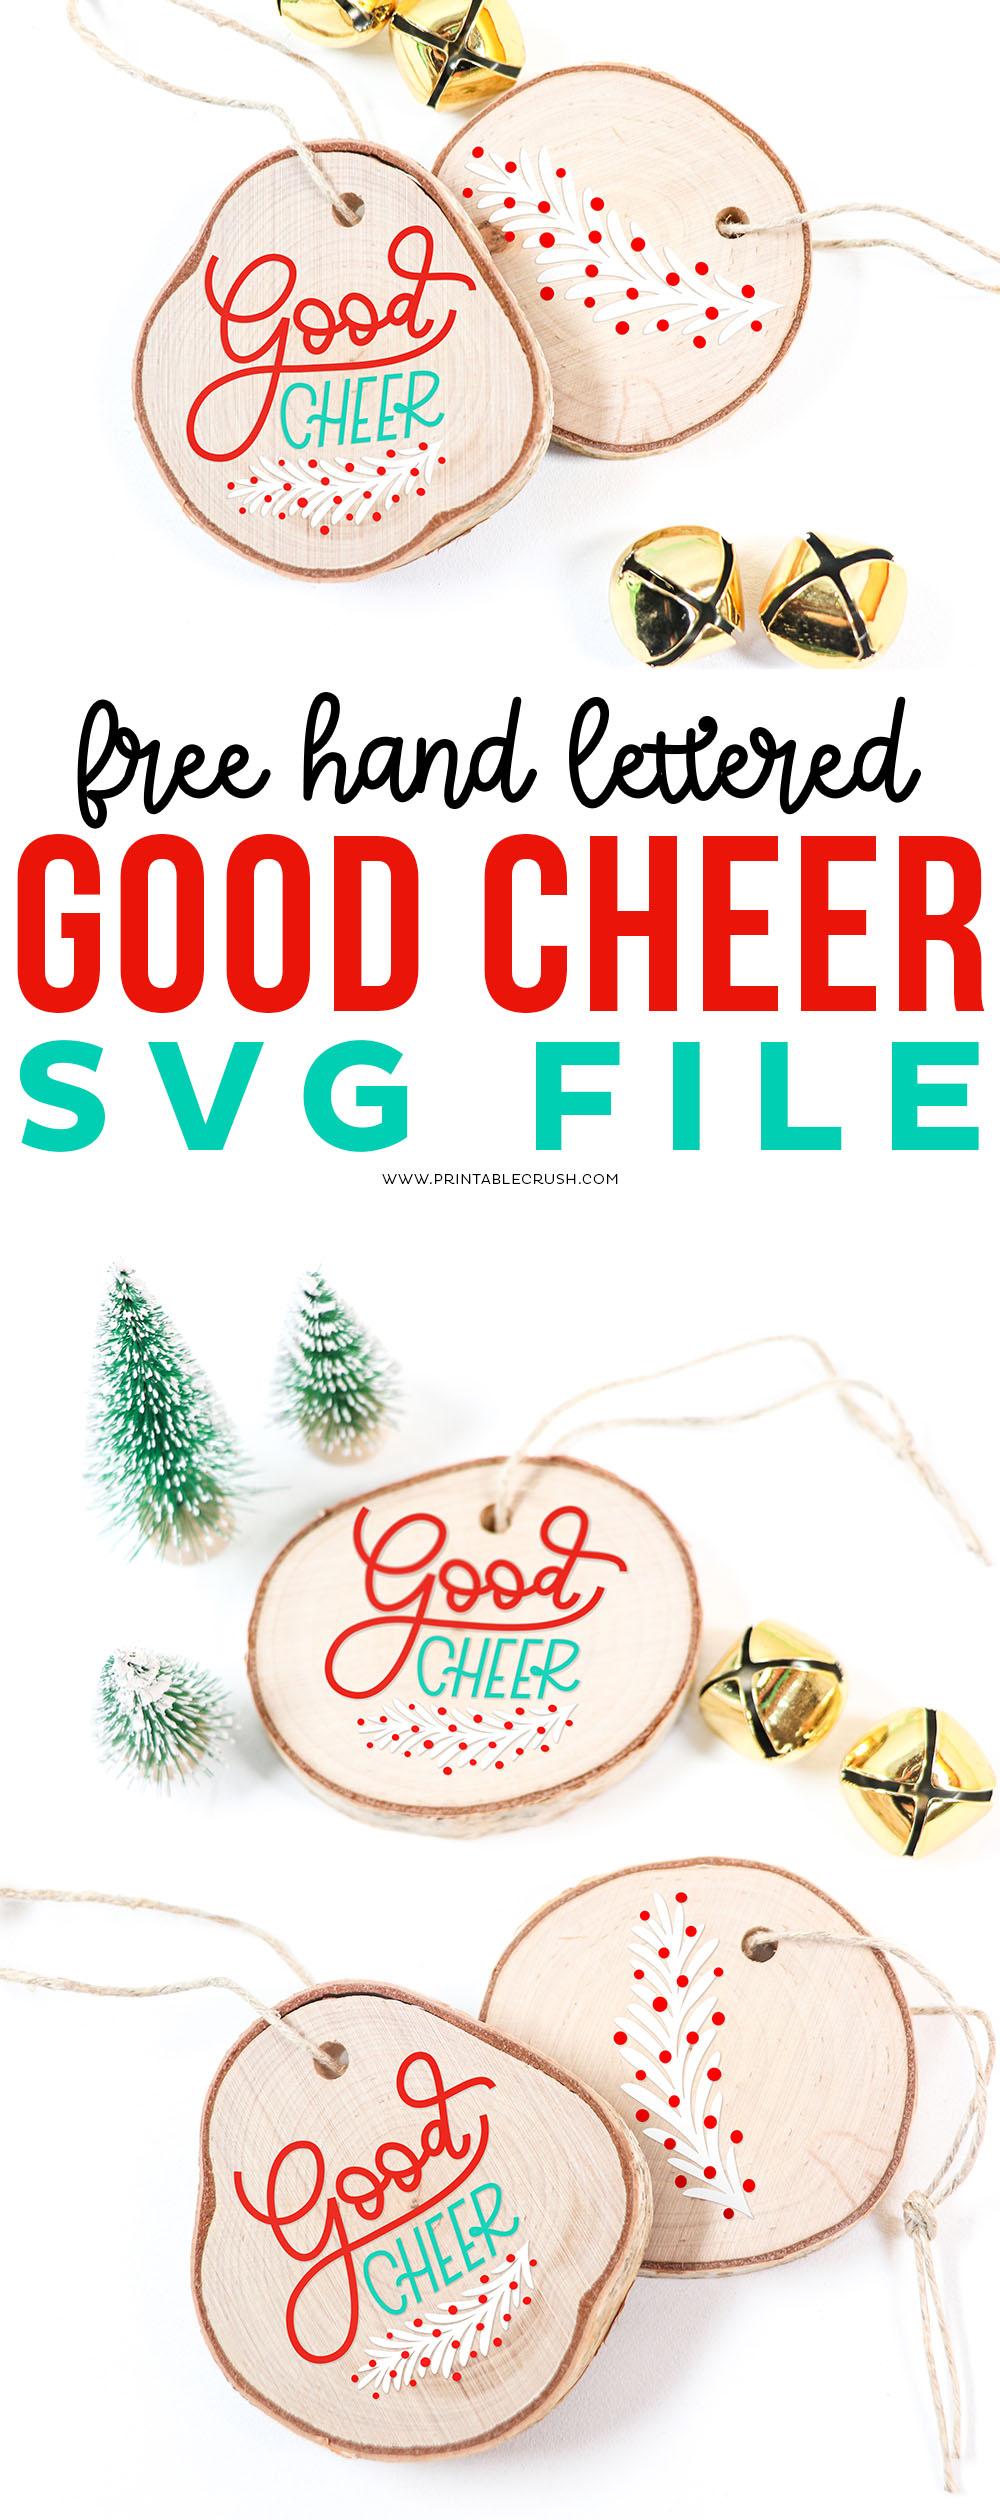 Free Good Cheer Hand Lettered SVG File - Printable Crush via @printablecrush